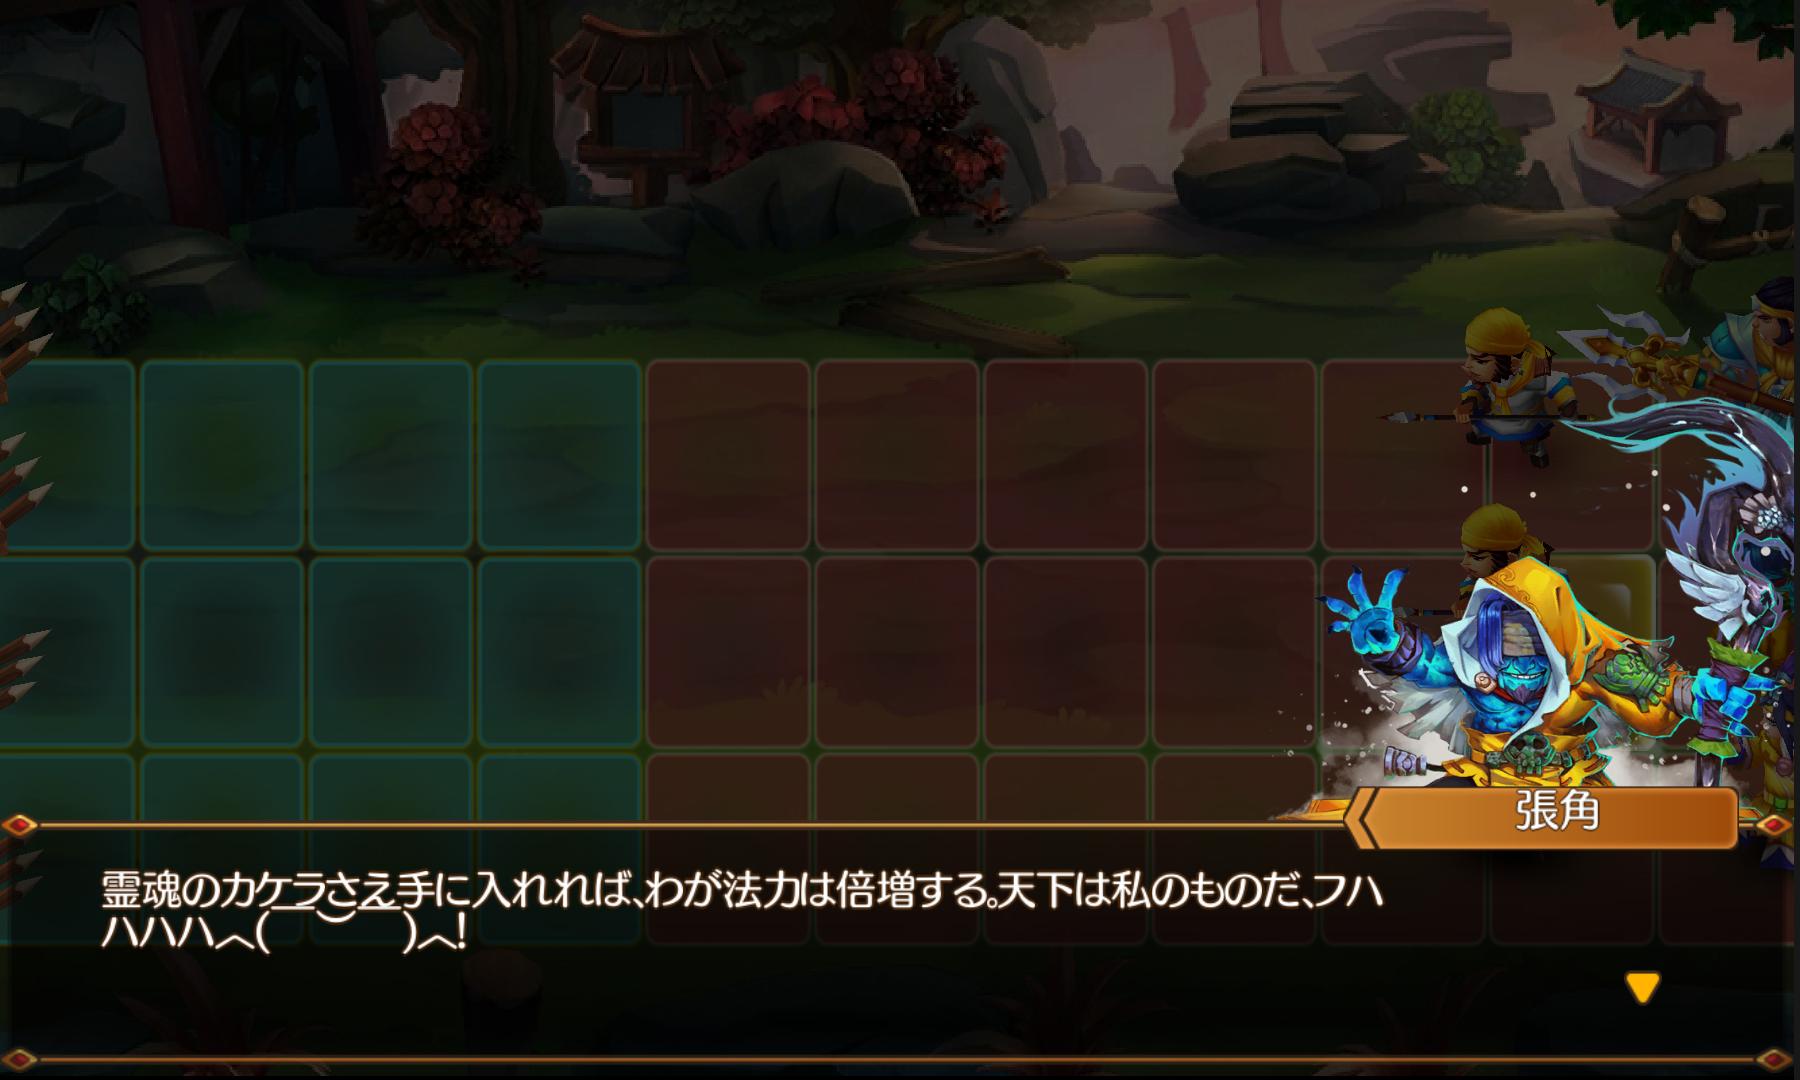 androidアプリ 三国志繚乱バトル攻略スクリーンショット3